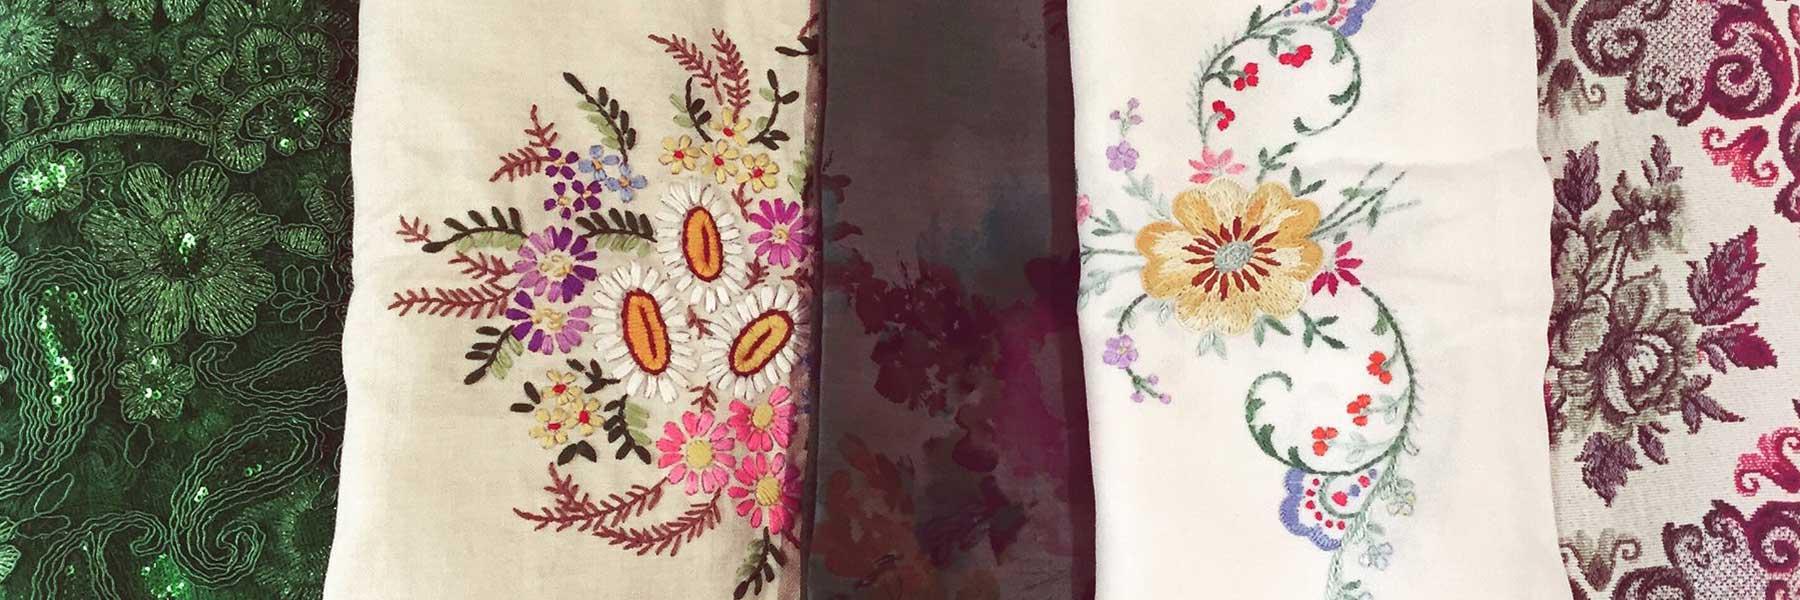 Bespoke Textiles fabrics